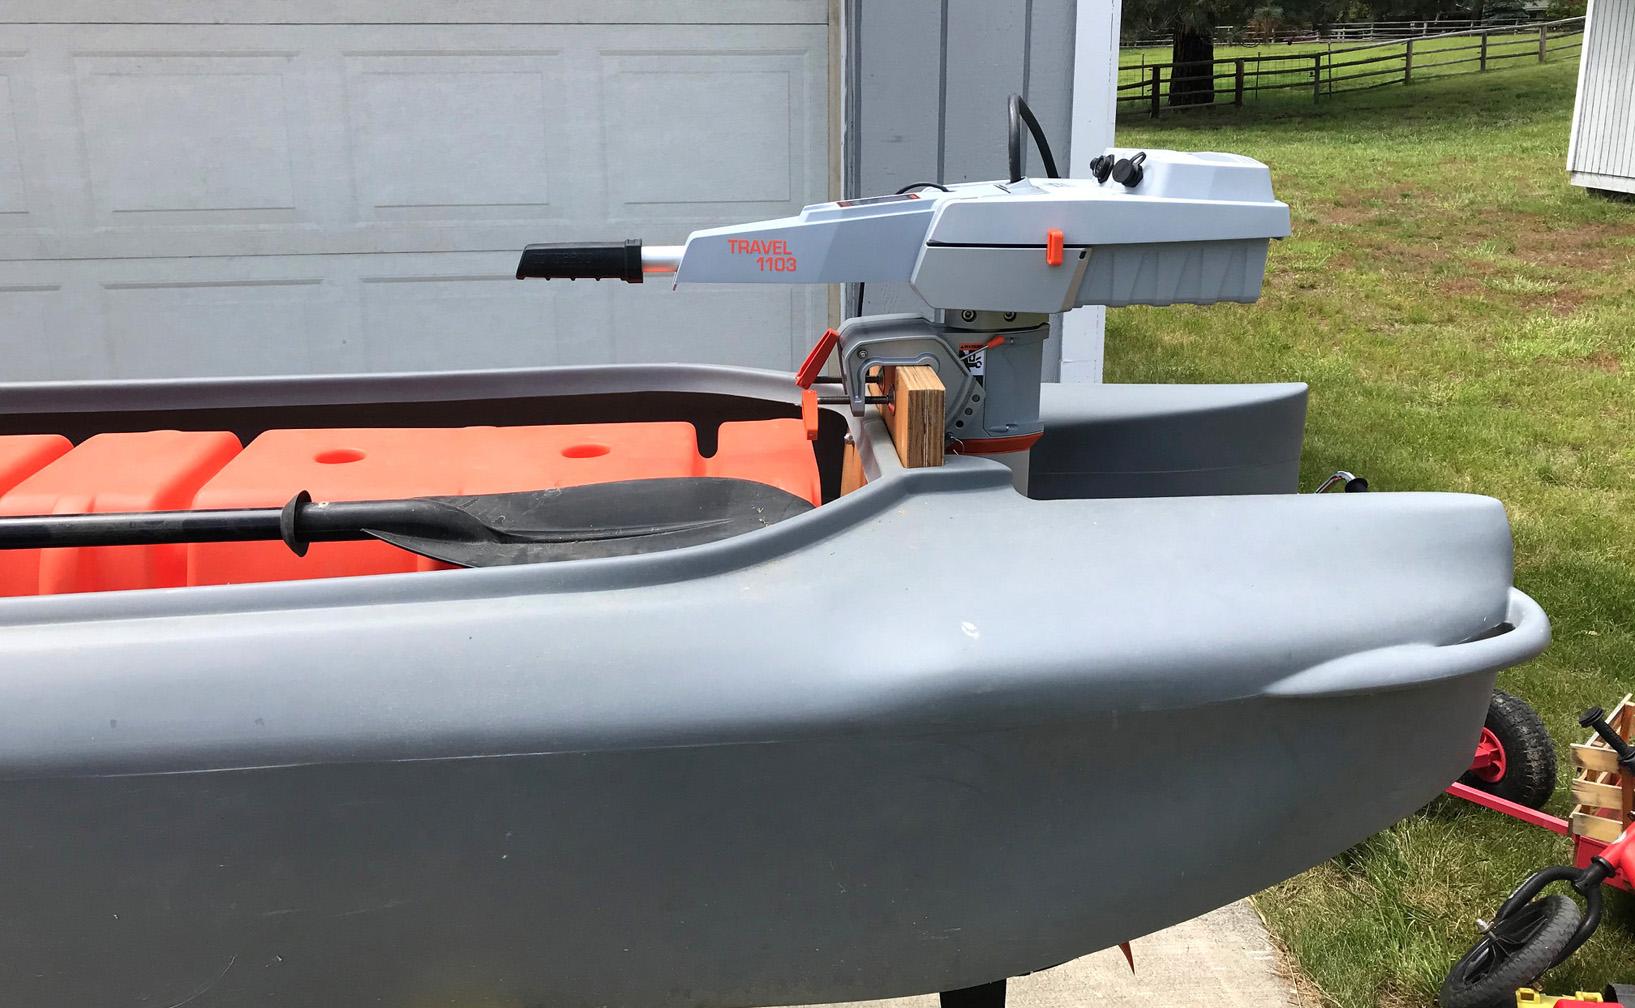 The Torqeedo 1103 mounted at the stern of my Wavewalk S4 kayak